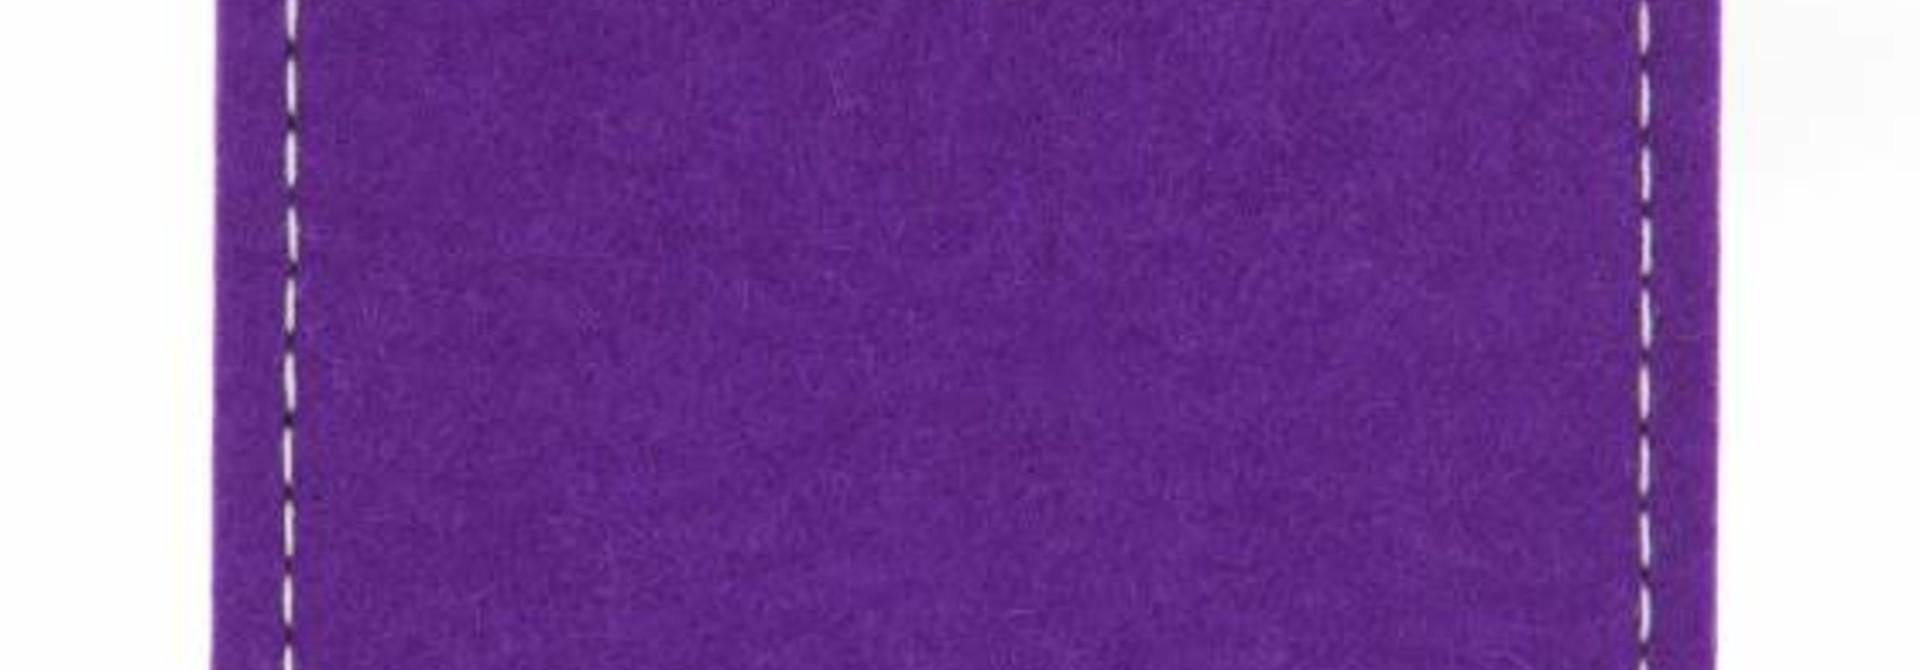 Pixel Sleeve Lila